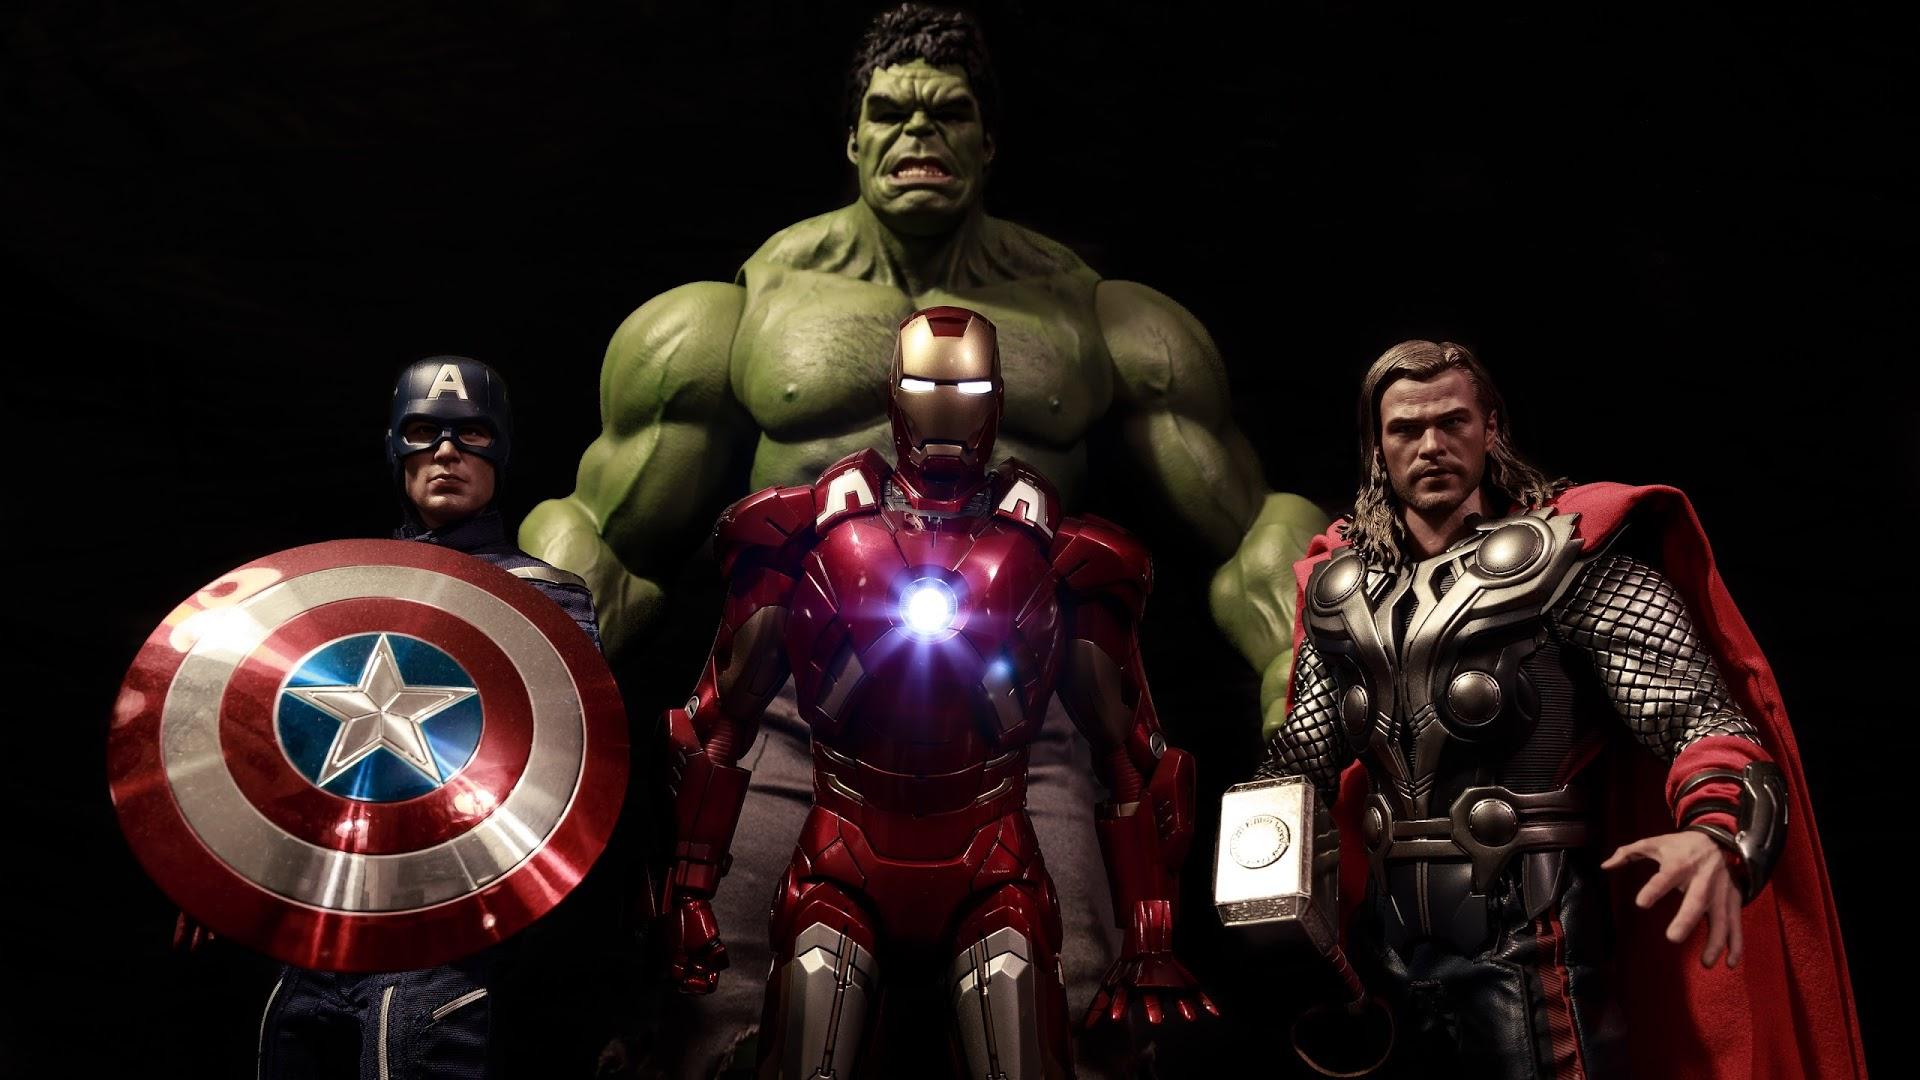 man, wolverine, captain america & hulk wallpapers :: hd wallpapers